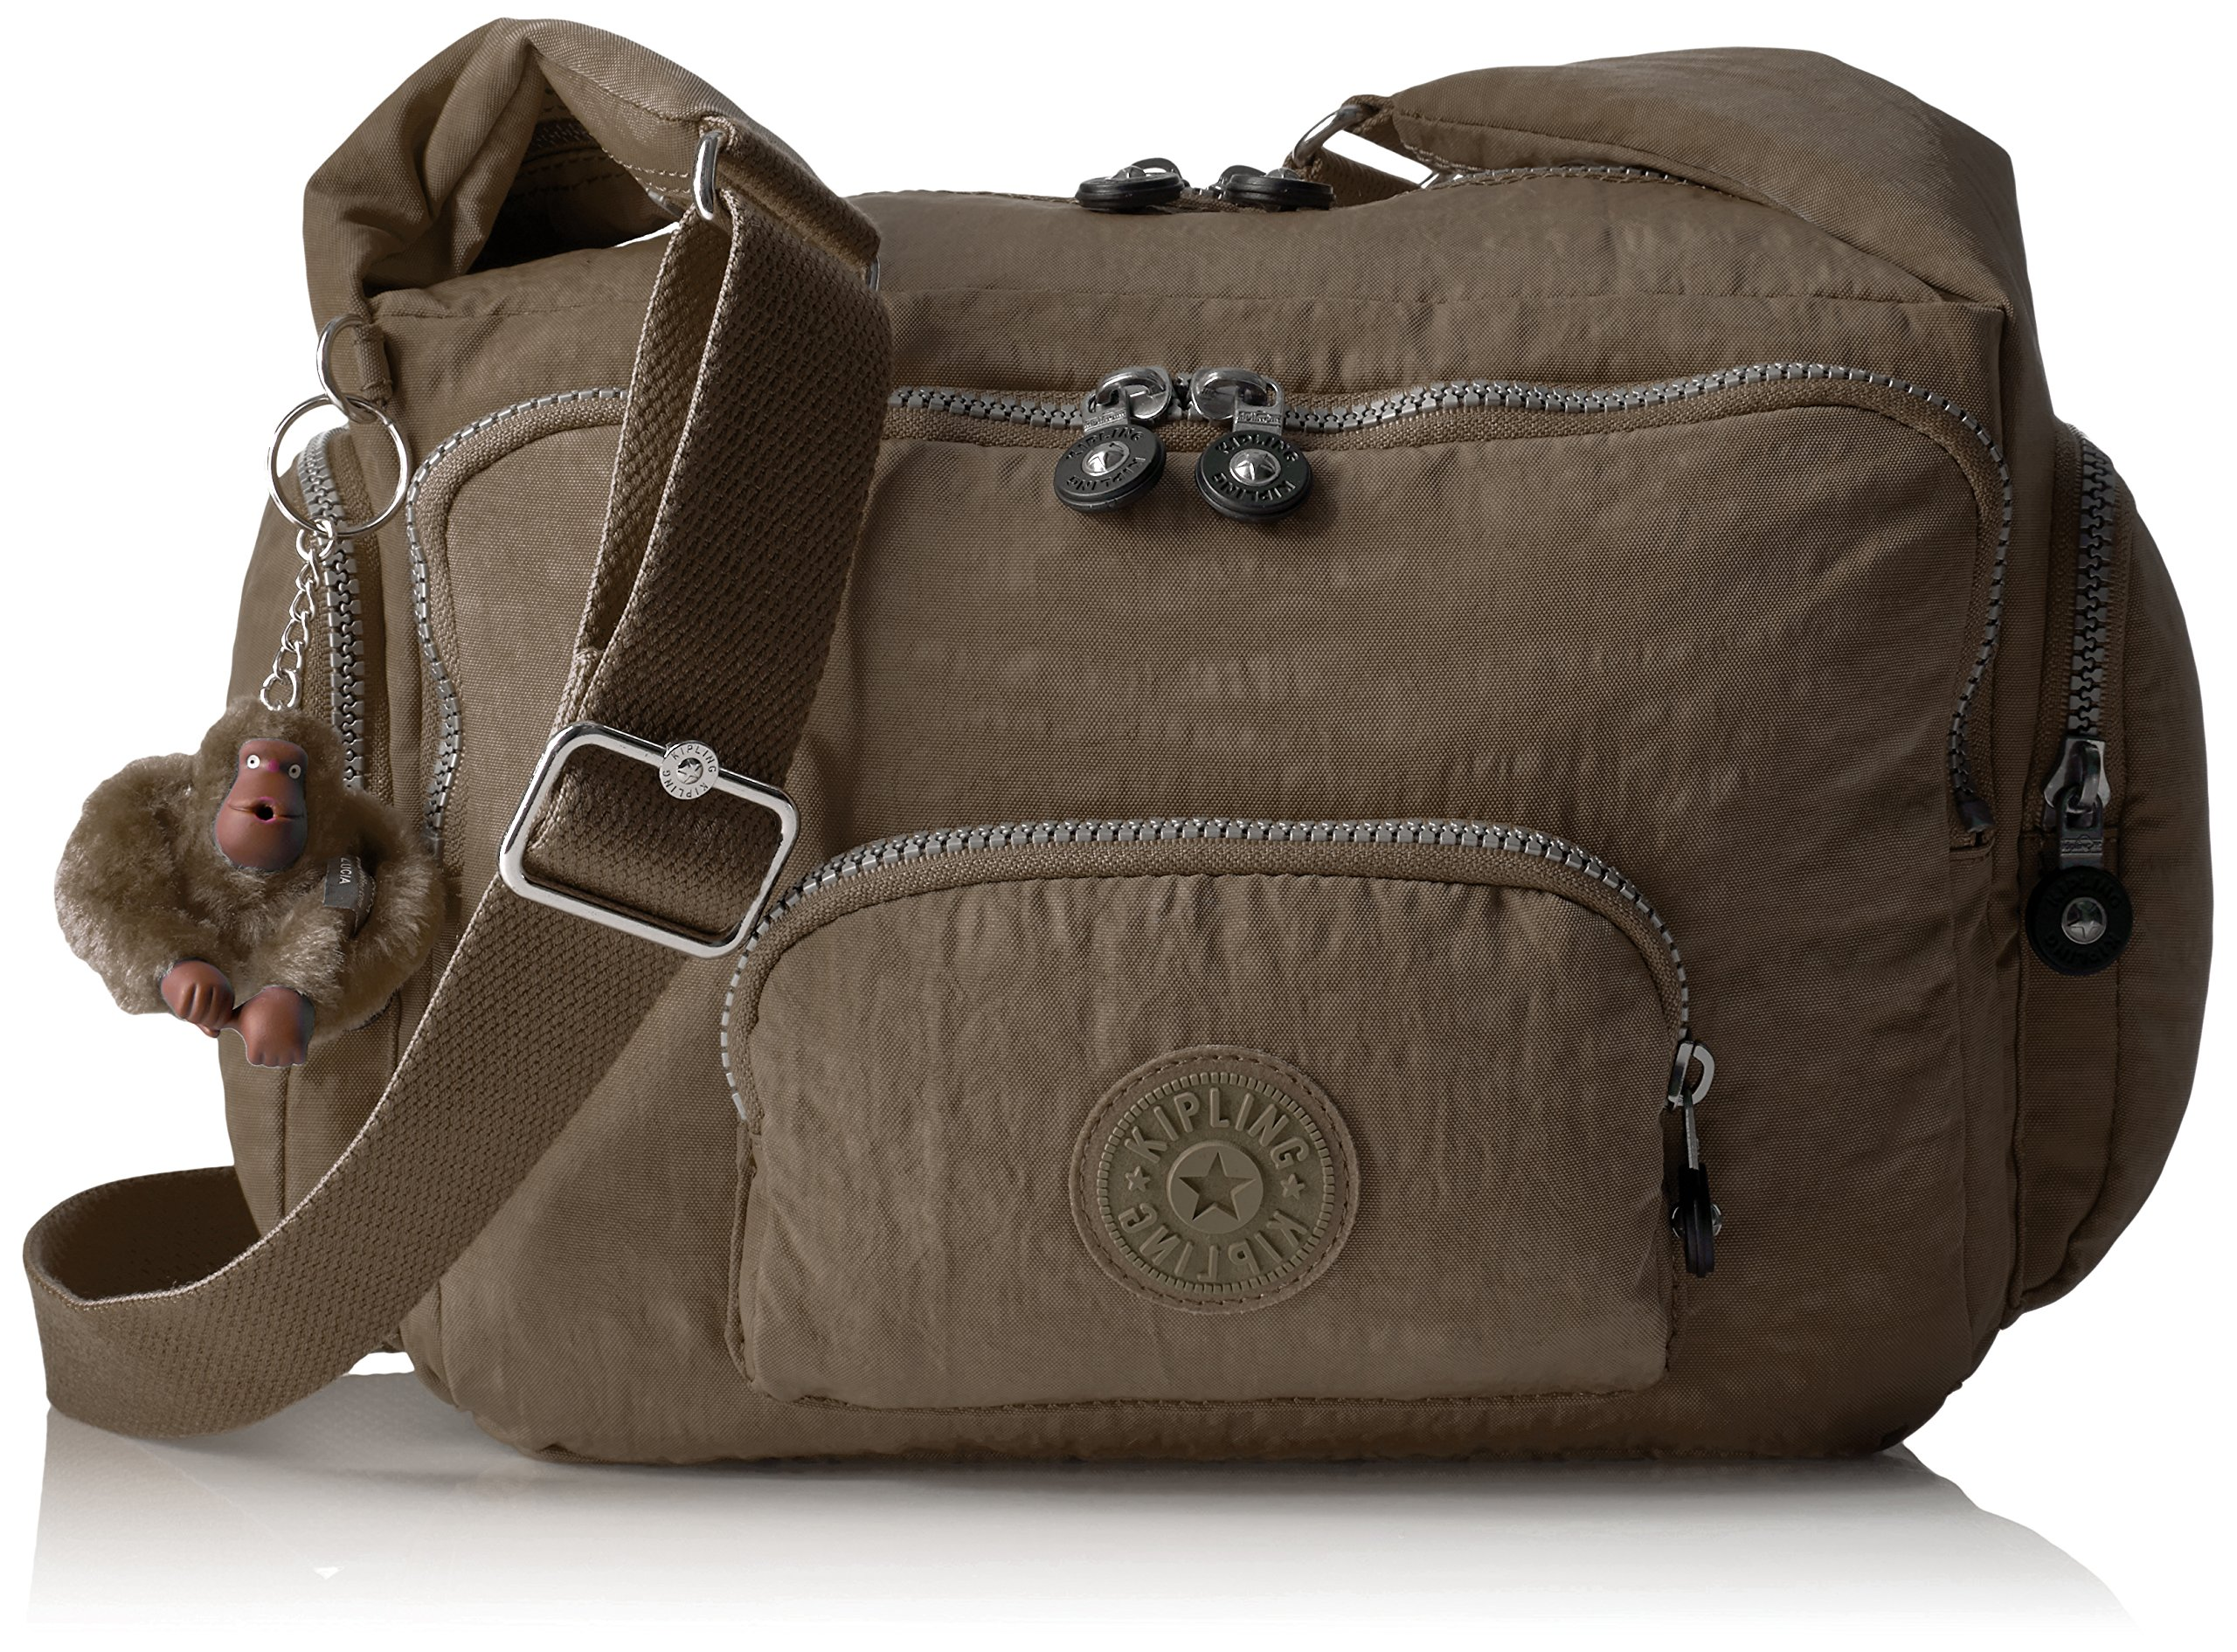 Kipling Erica Solid Crossbody Bag, Soft Earthy Beige by Kipling